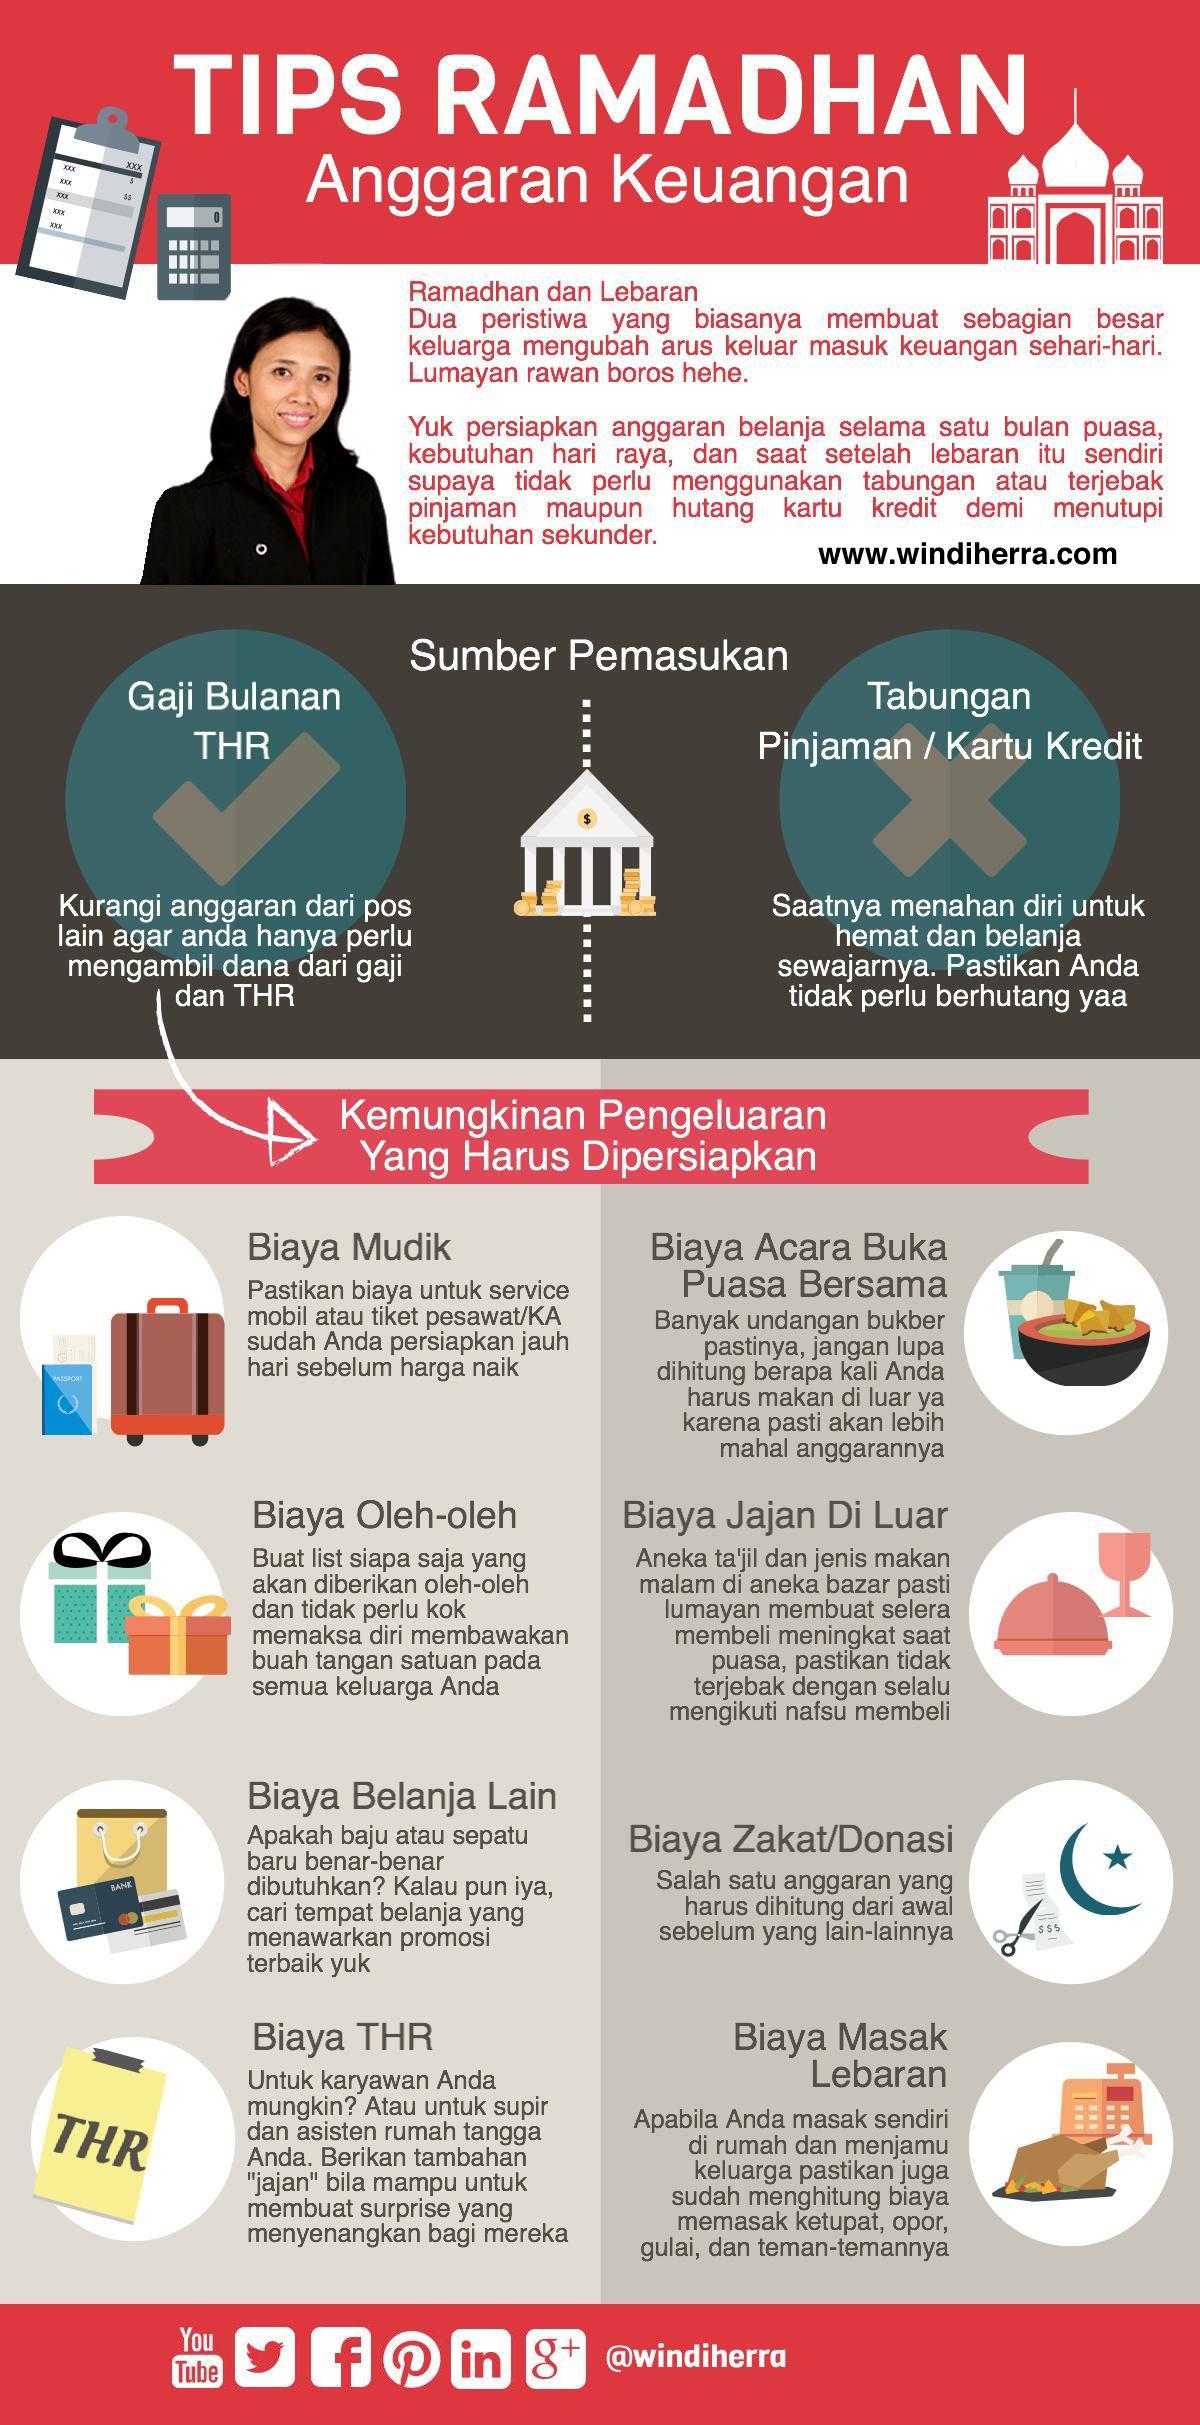 Tips ramadhan anggaran keuangan finance dan